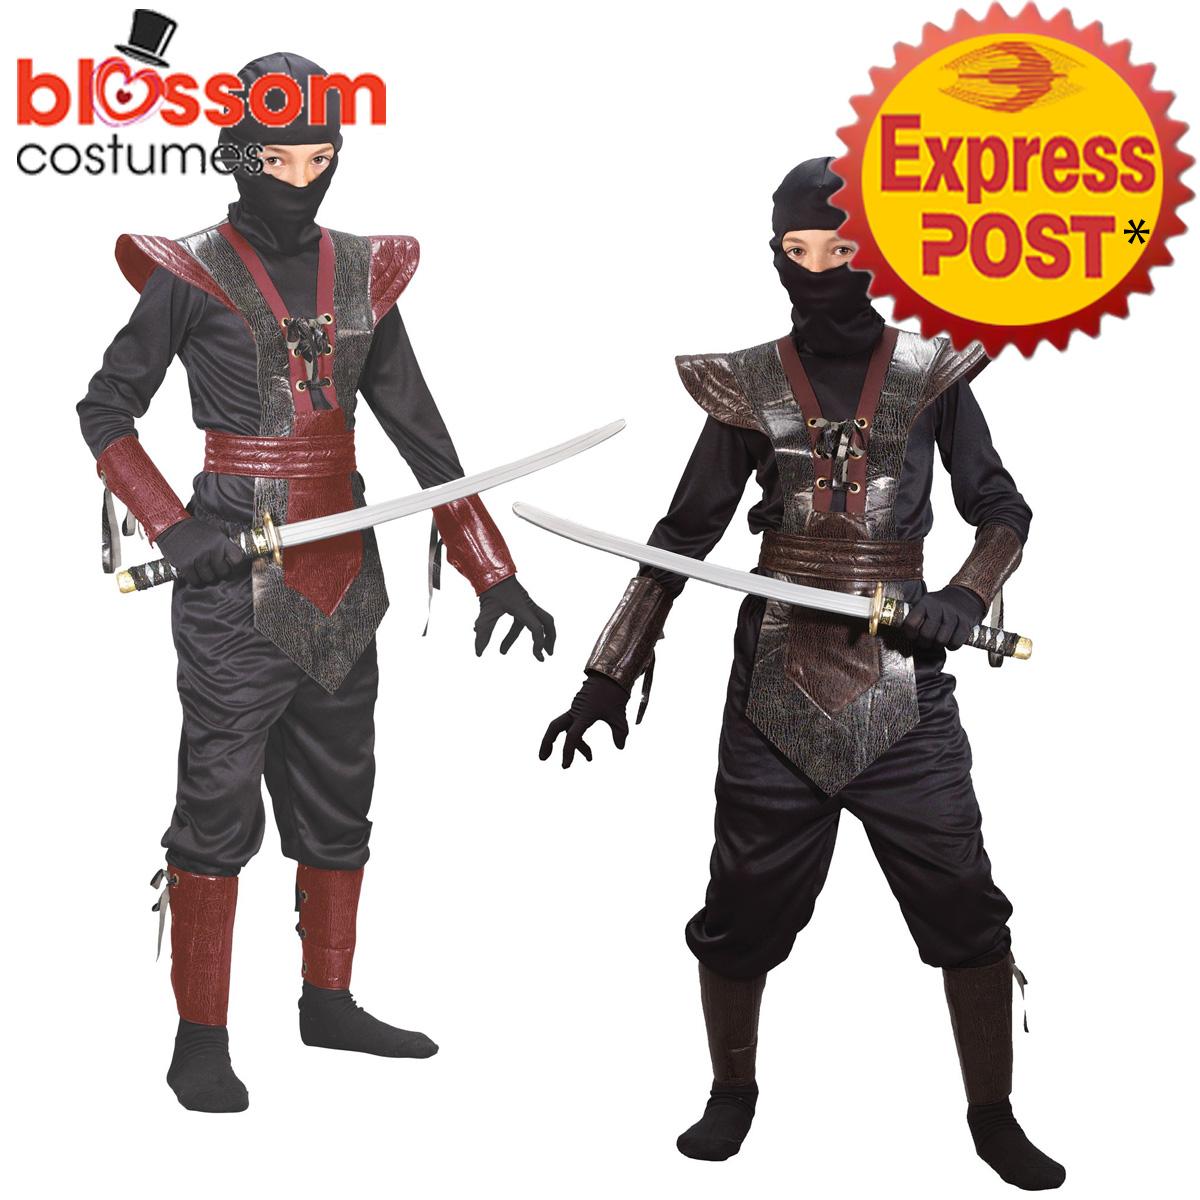 CK977-Leather-Ninja-Child-Kids-Warrior-Kungfu-Boys-Fancy-Dress-Costume-Book-Week